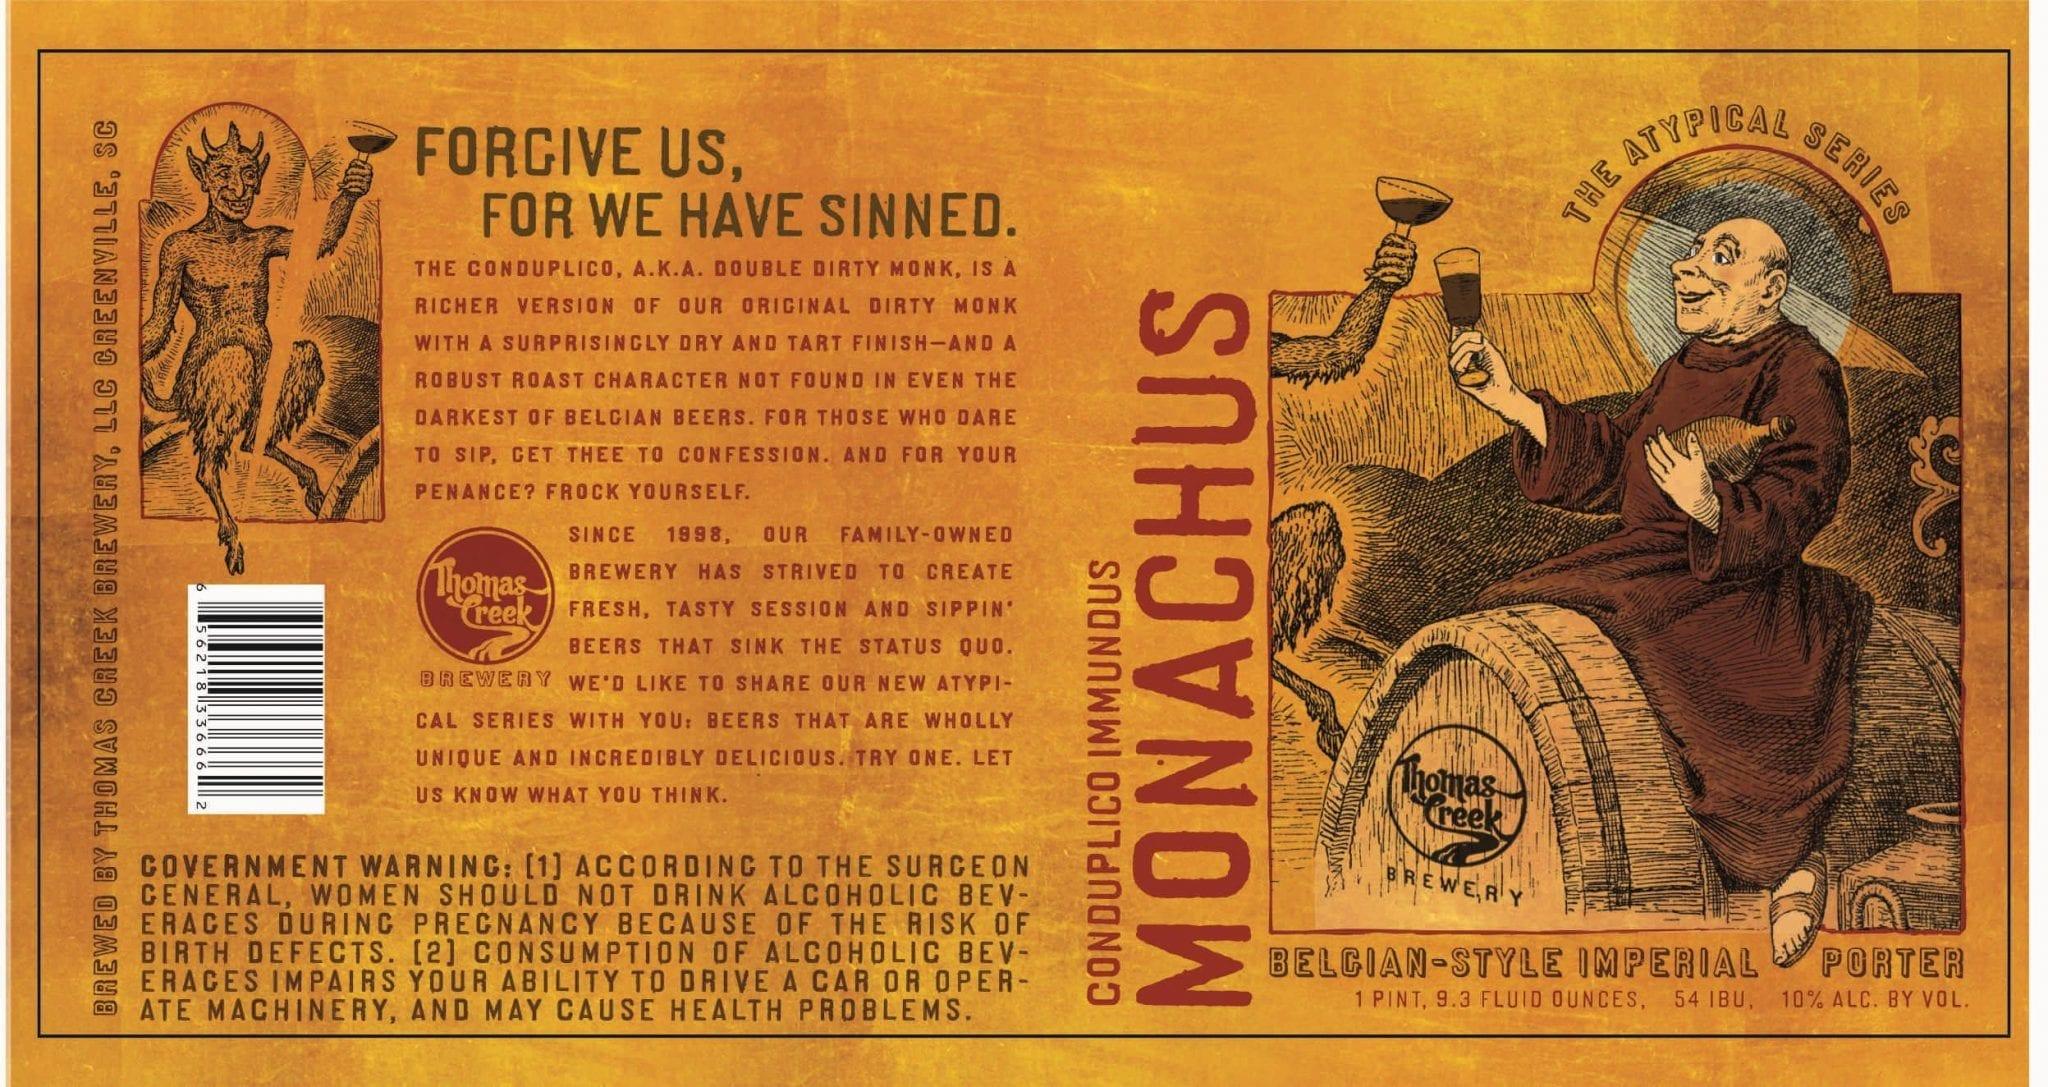 Thomas Creek Brewery Conduplico Immundus Monachus